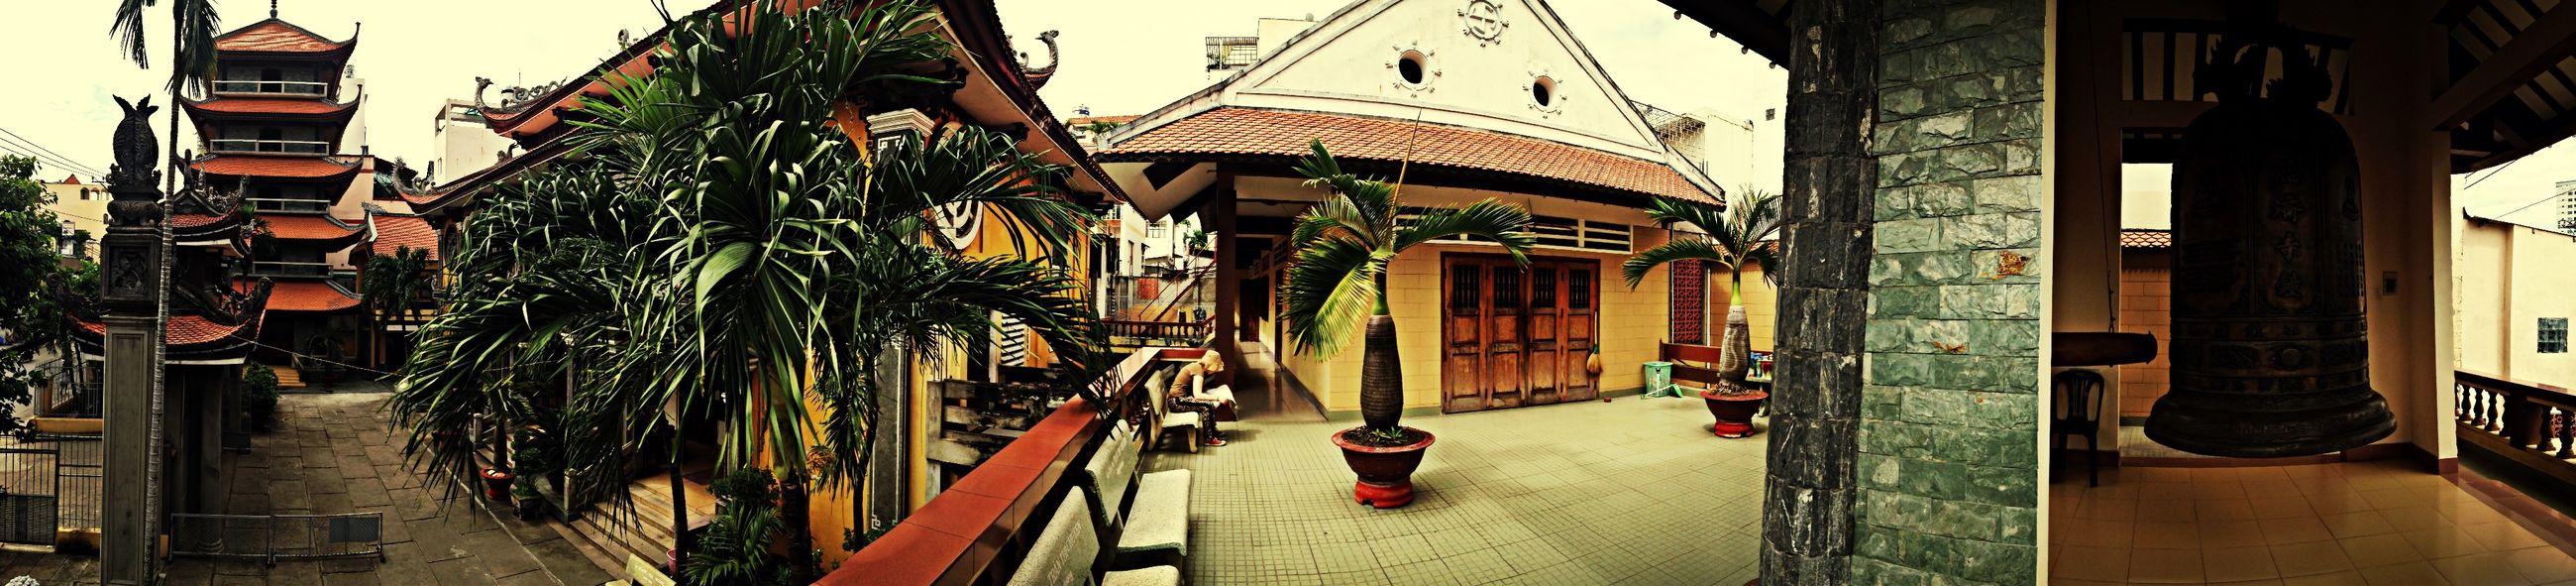 Pagoda Pagode Saigon Temple Hanging Out Enjoying Life Check This Out Hello World Vietnam Walking Around